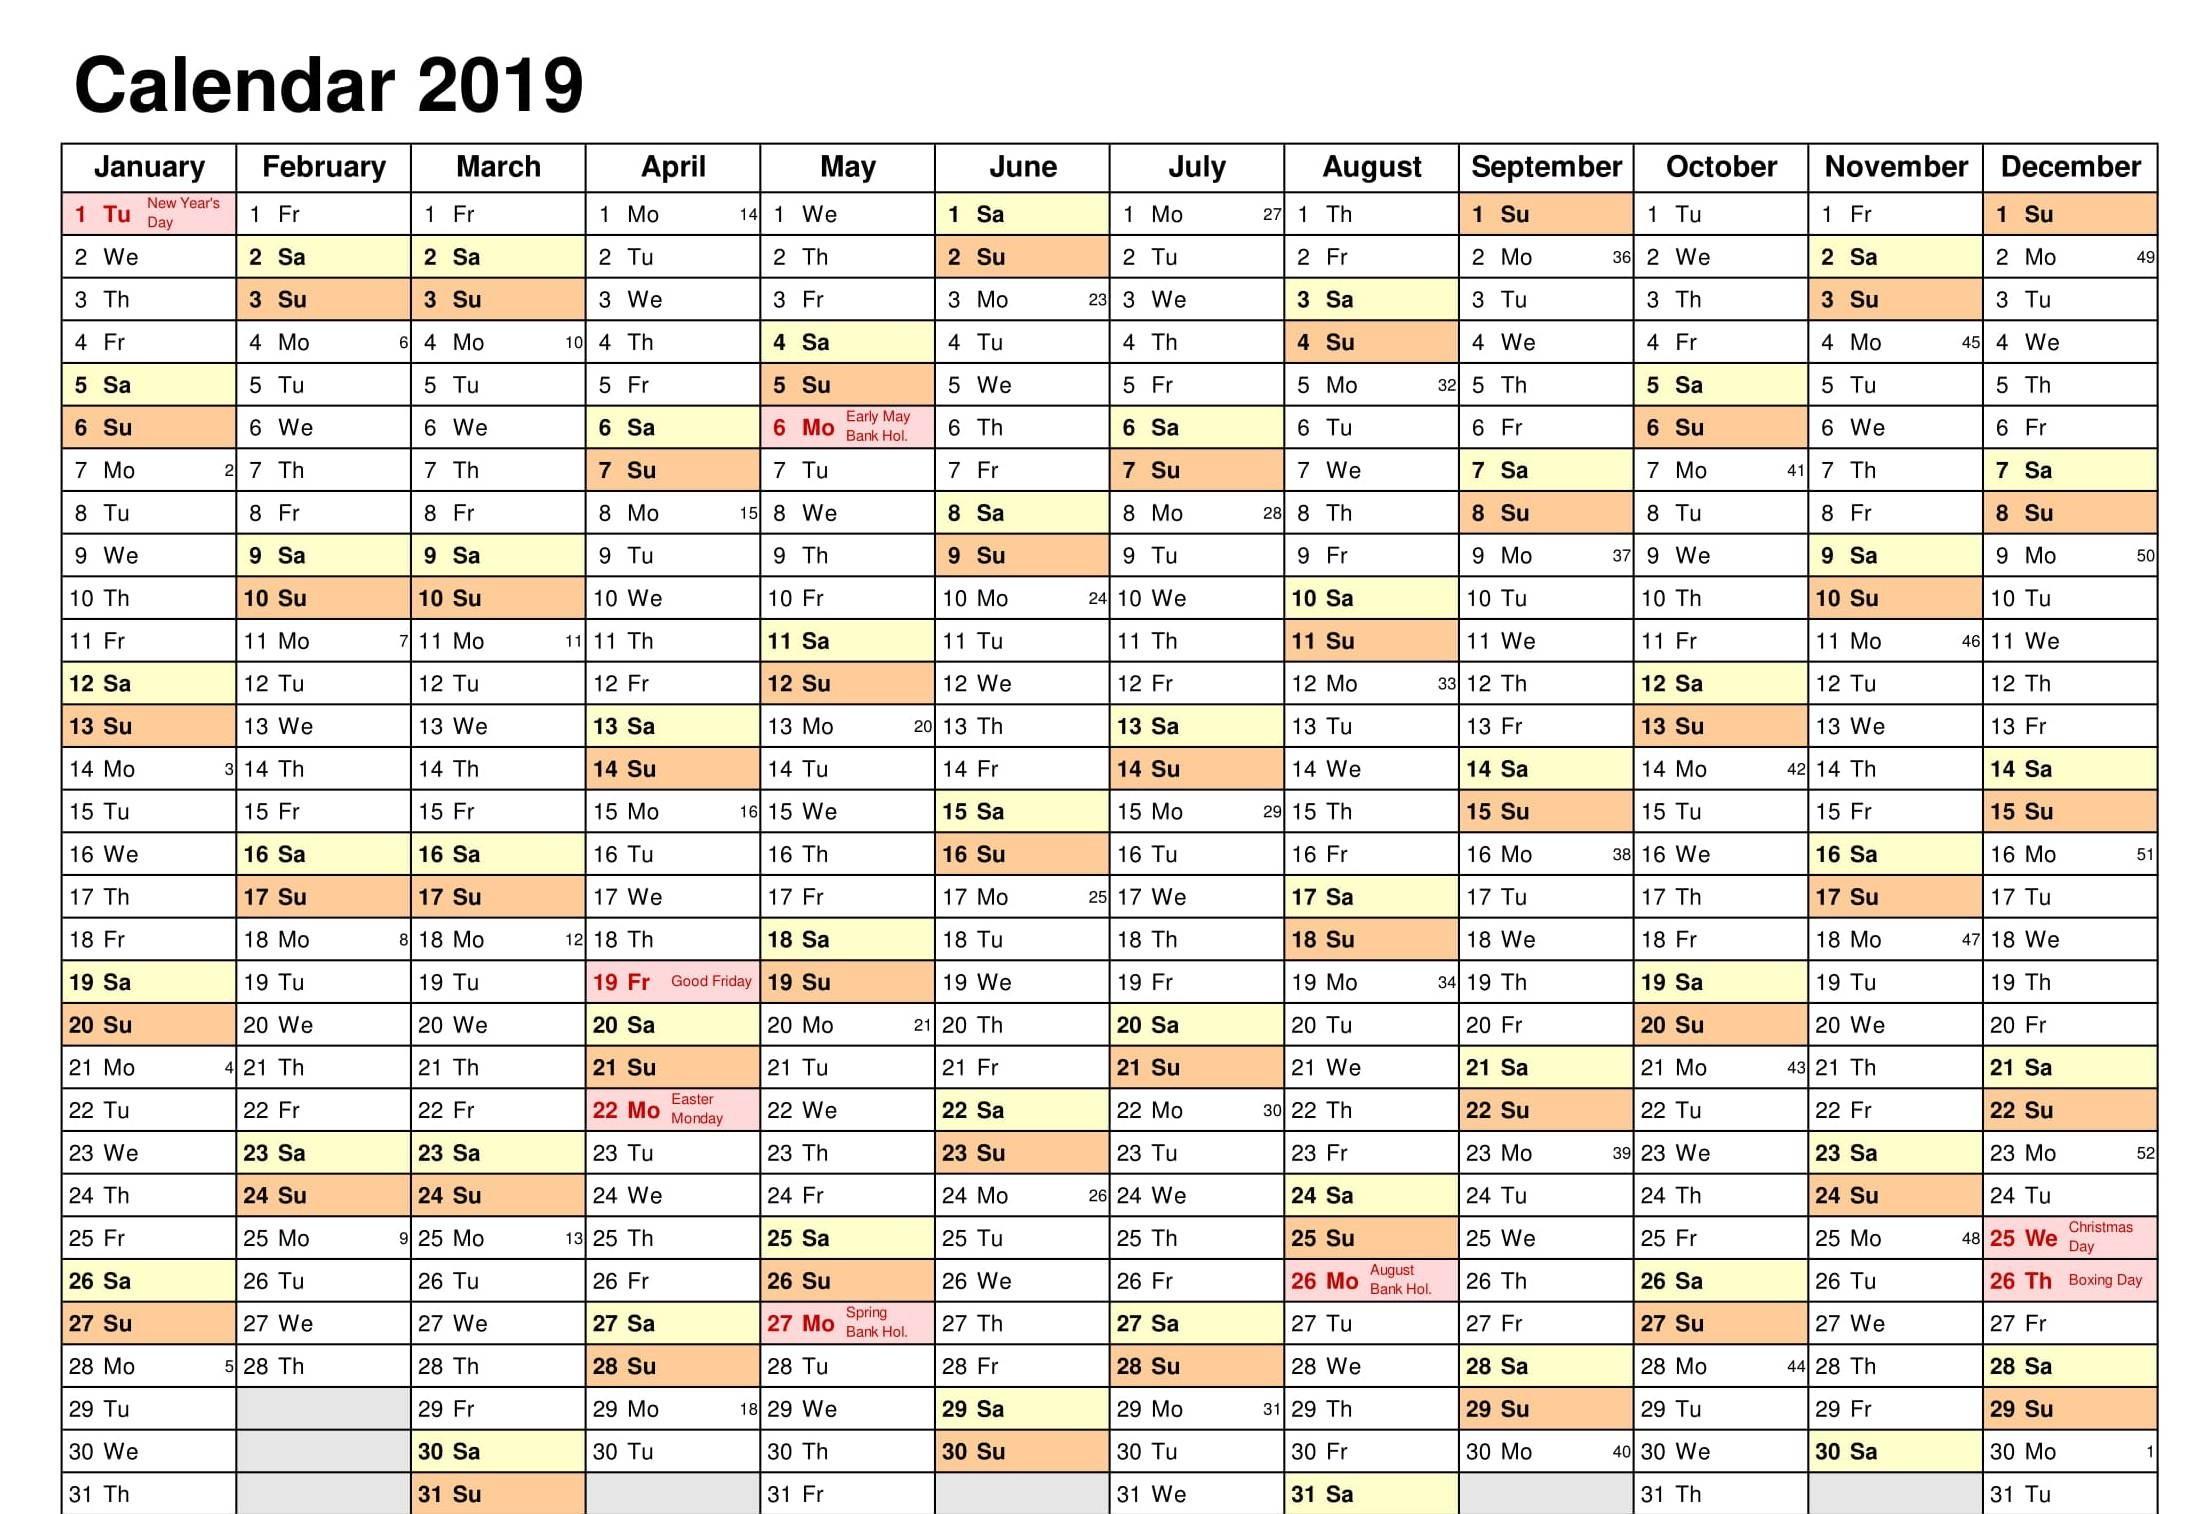 schedule template editable  2019 Editable Calendar Excel | Free Printable Planner ..